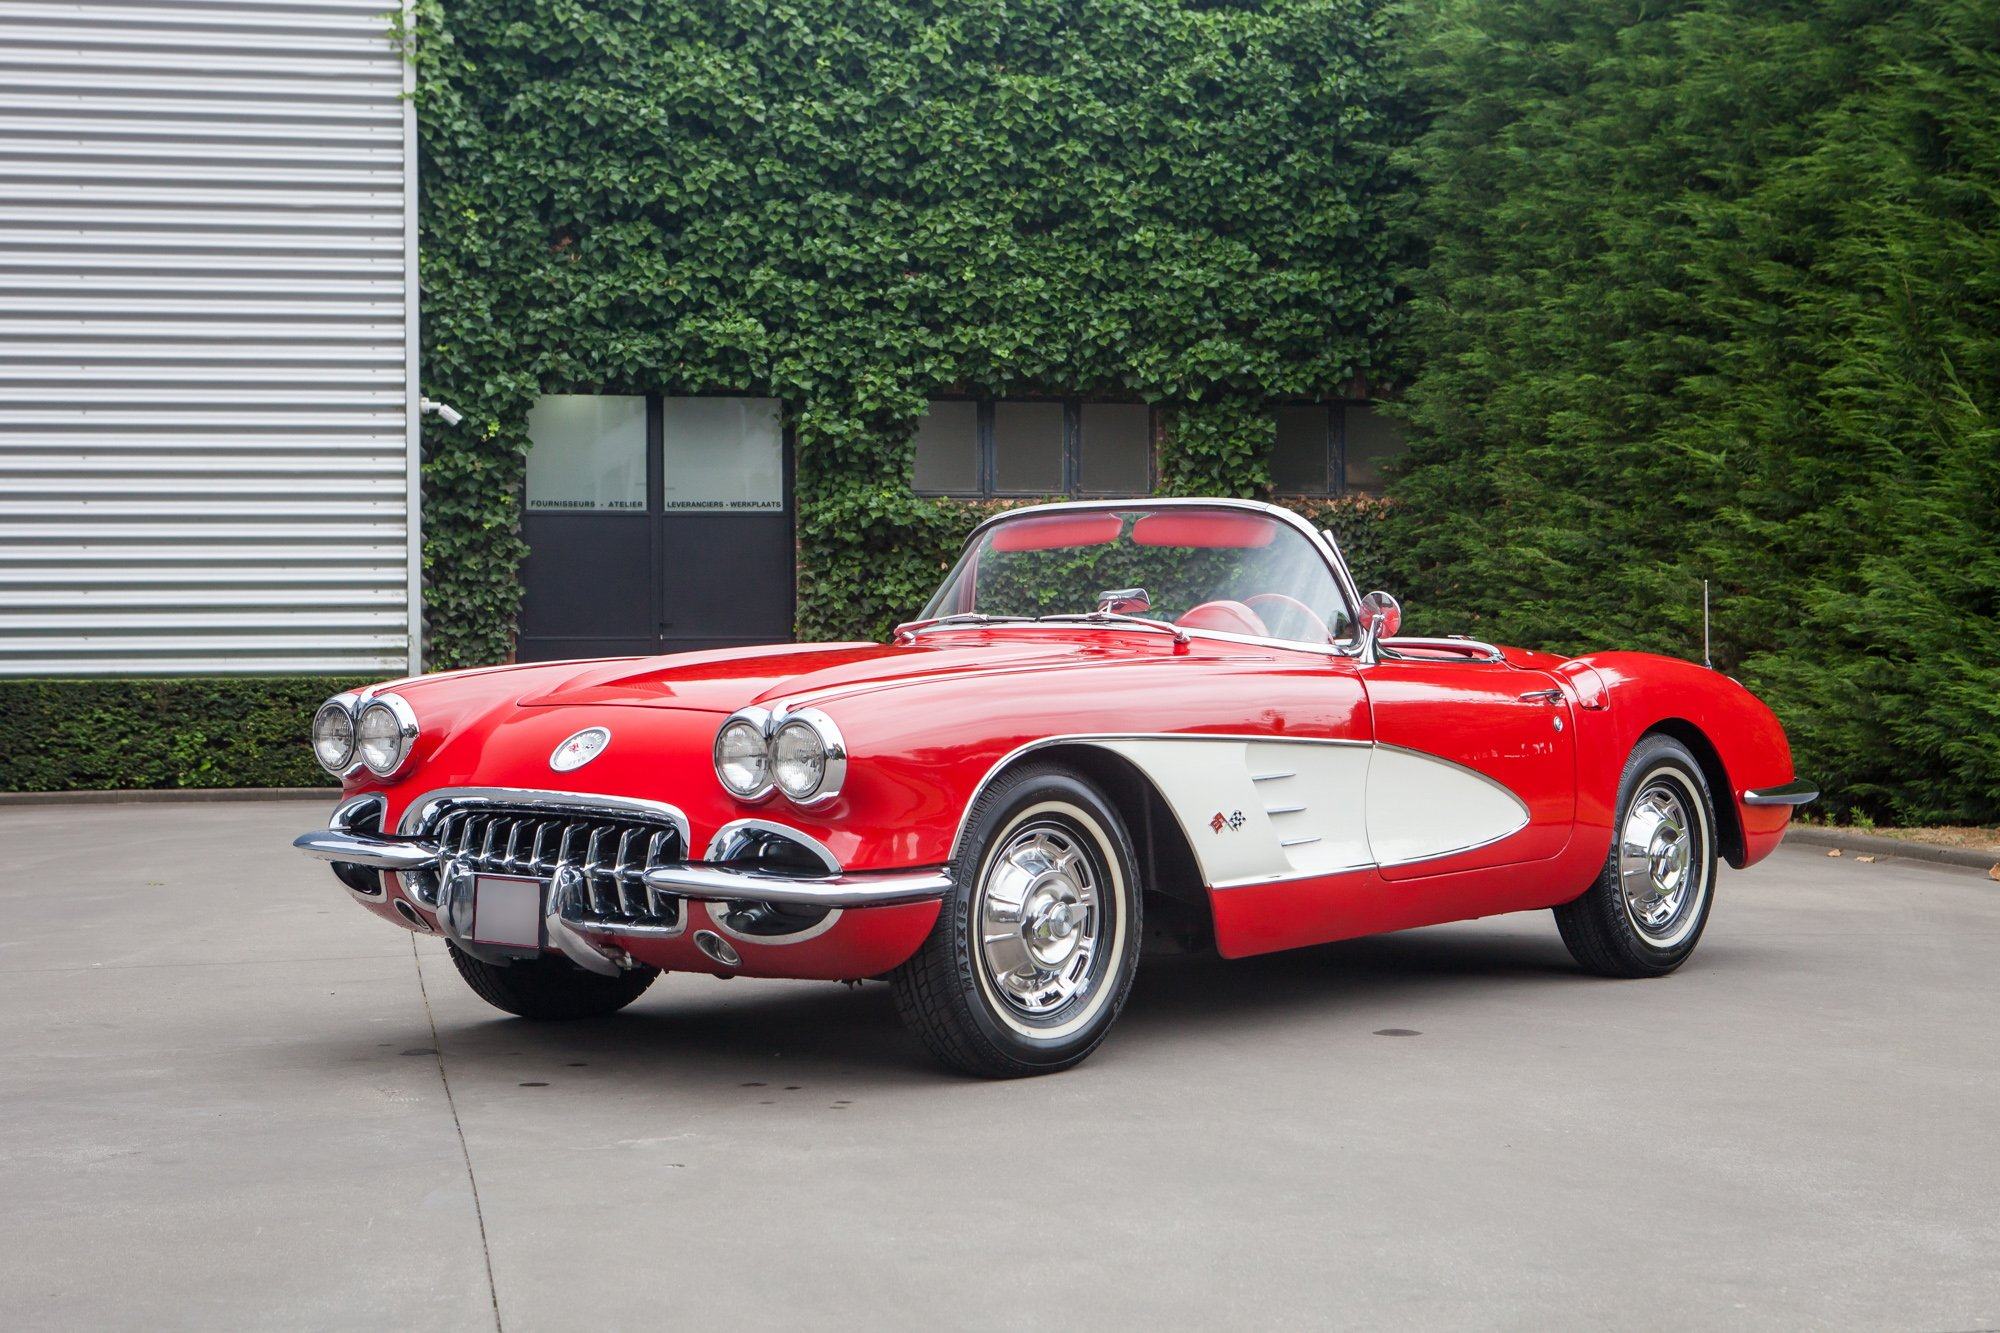 Kelebihan Kekurangan Corvette 1959 Murah Berkualitas